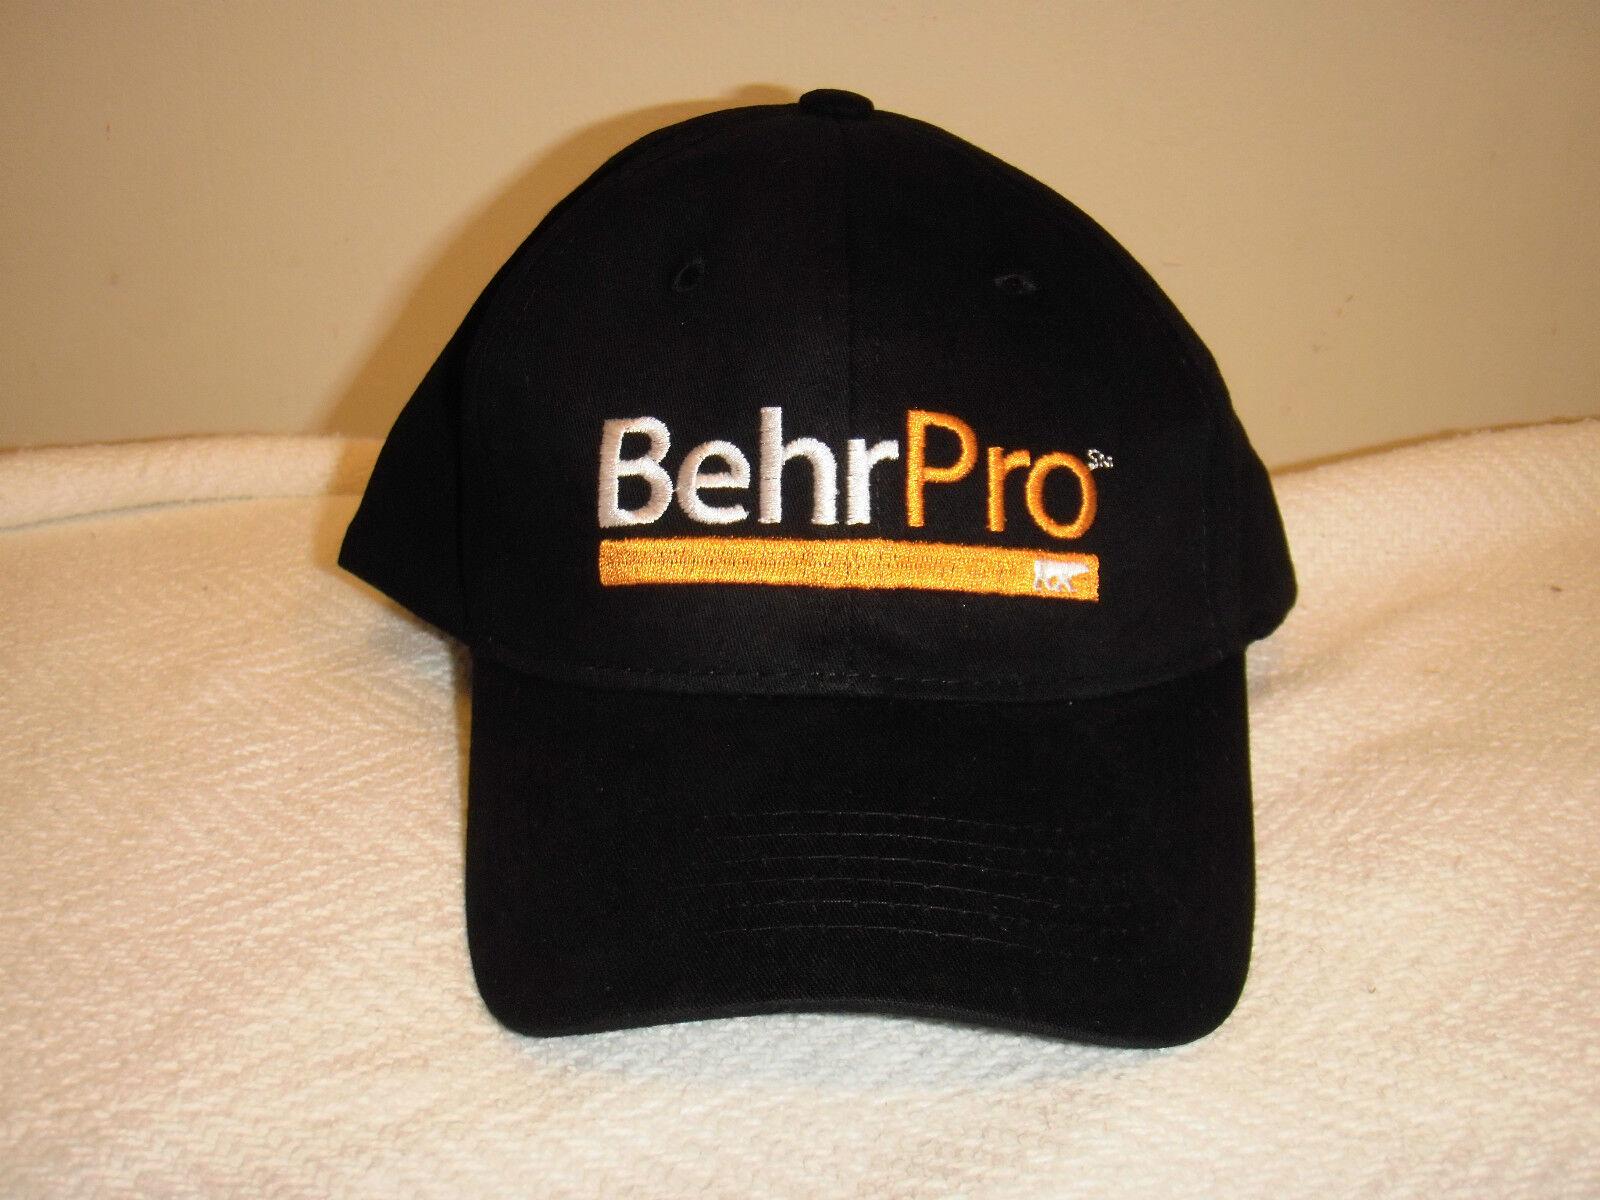 96c83ee7 BEHR Pro Paint Baseball Hat Black Kilz Primer Painter Cap Home DEPOT ...